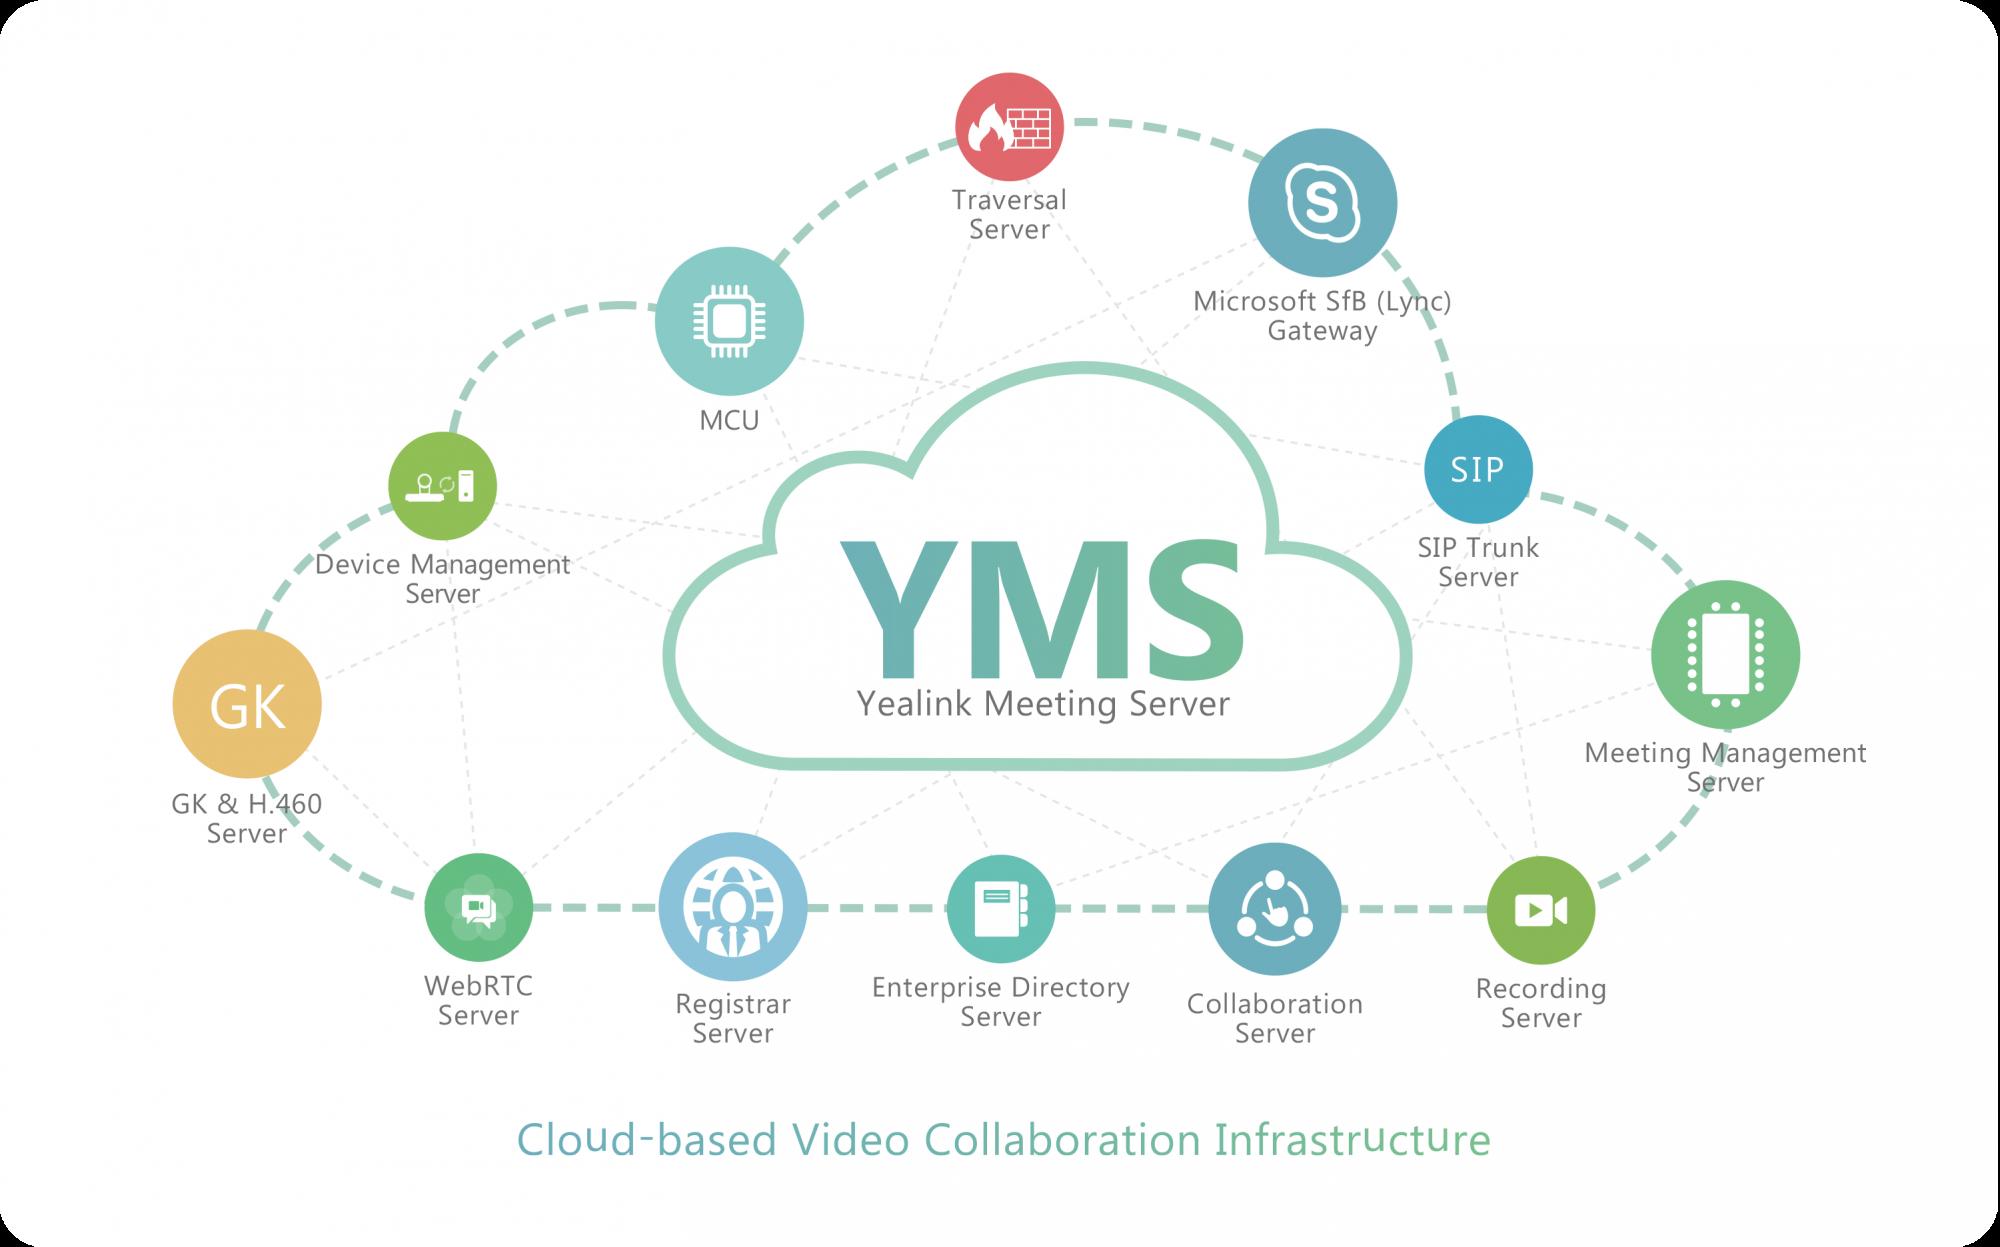 Yealink Meeting  Server - Videoconferencia em Nuvem   - Northshop São Paulo